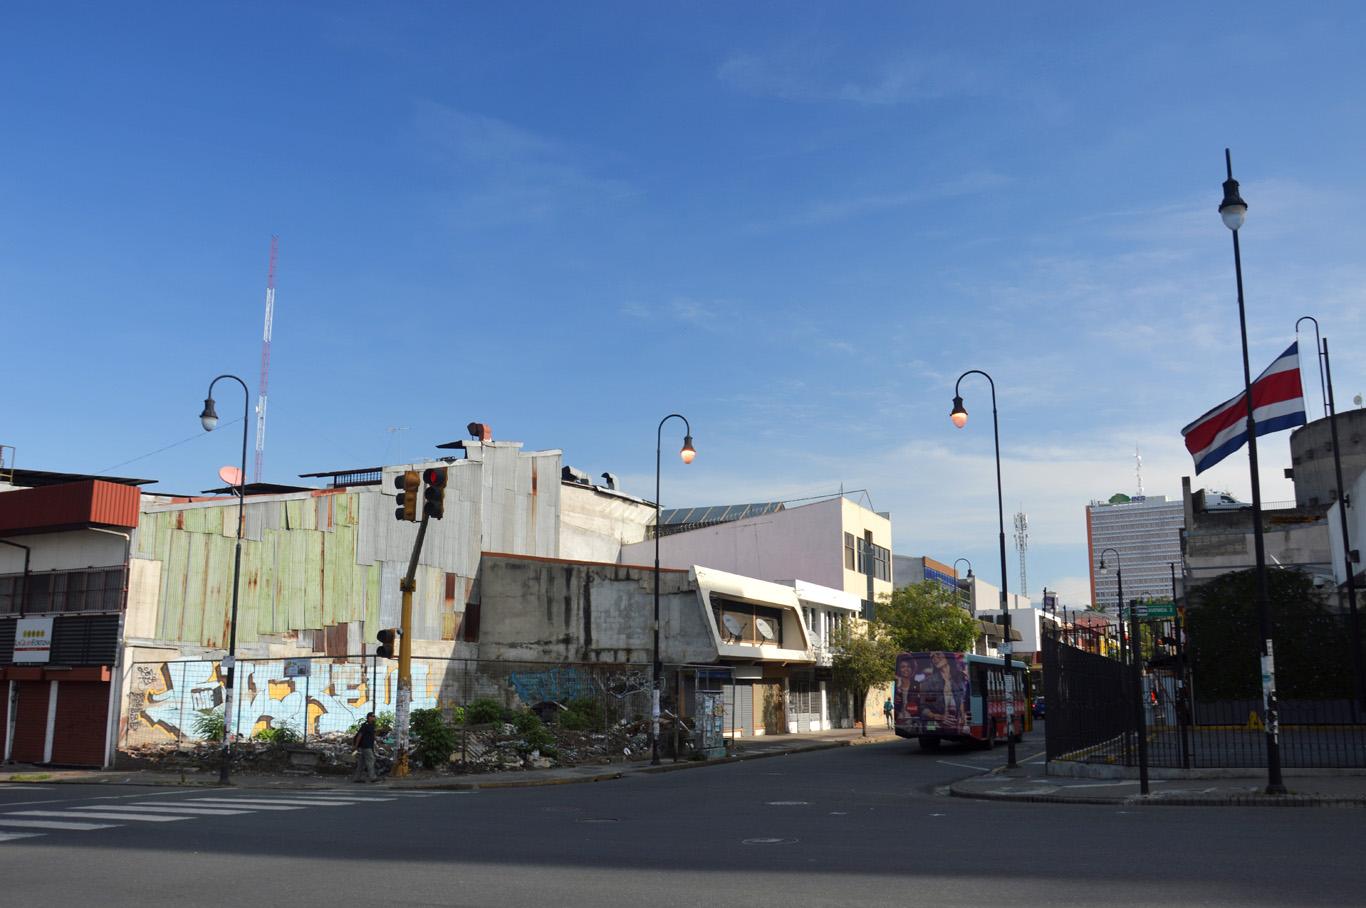 San Jose outside the city center